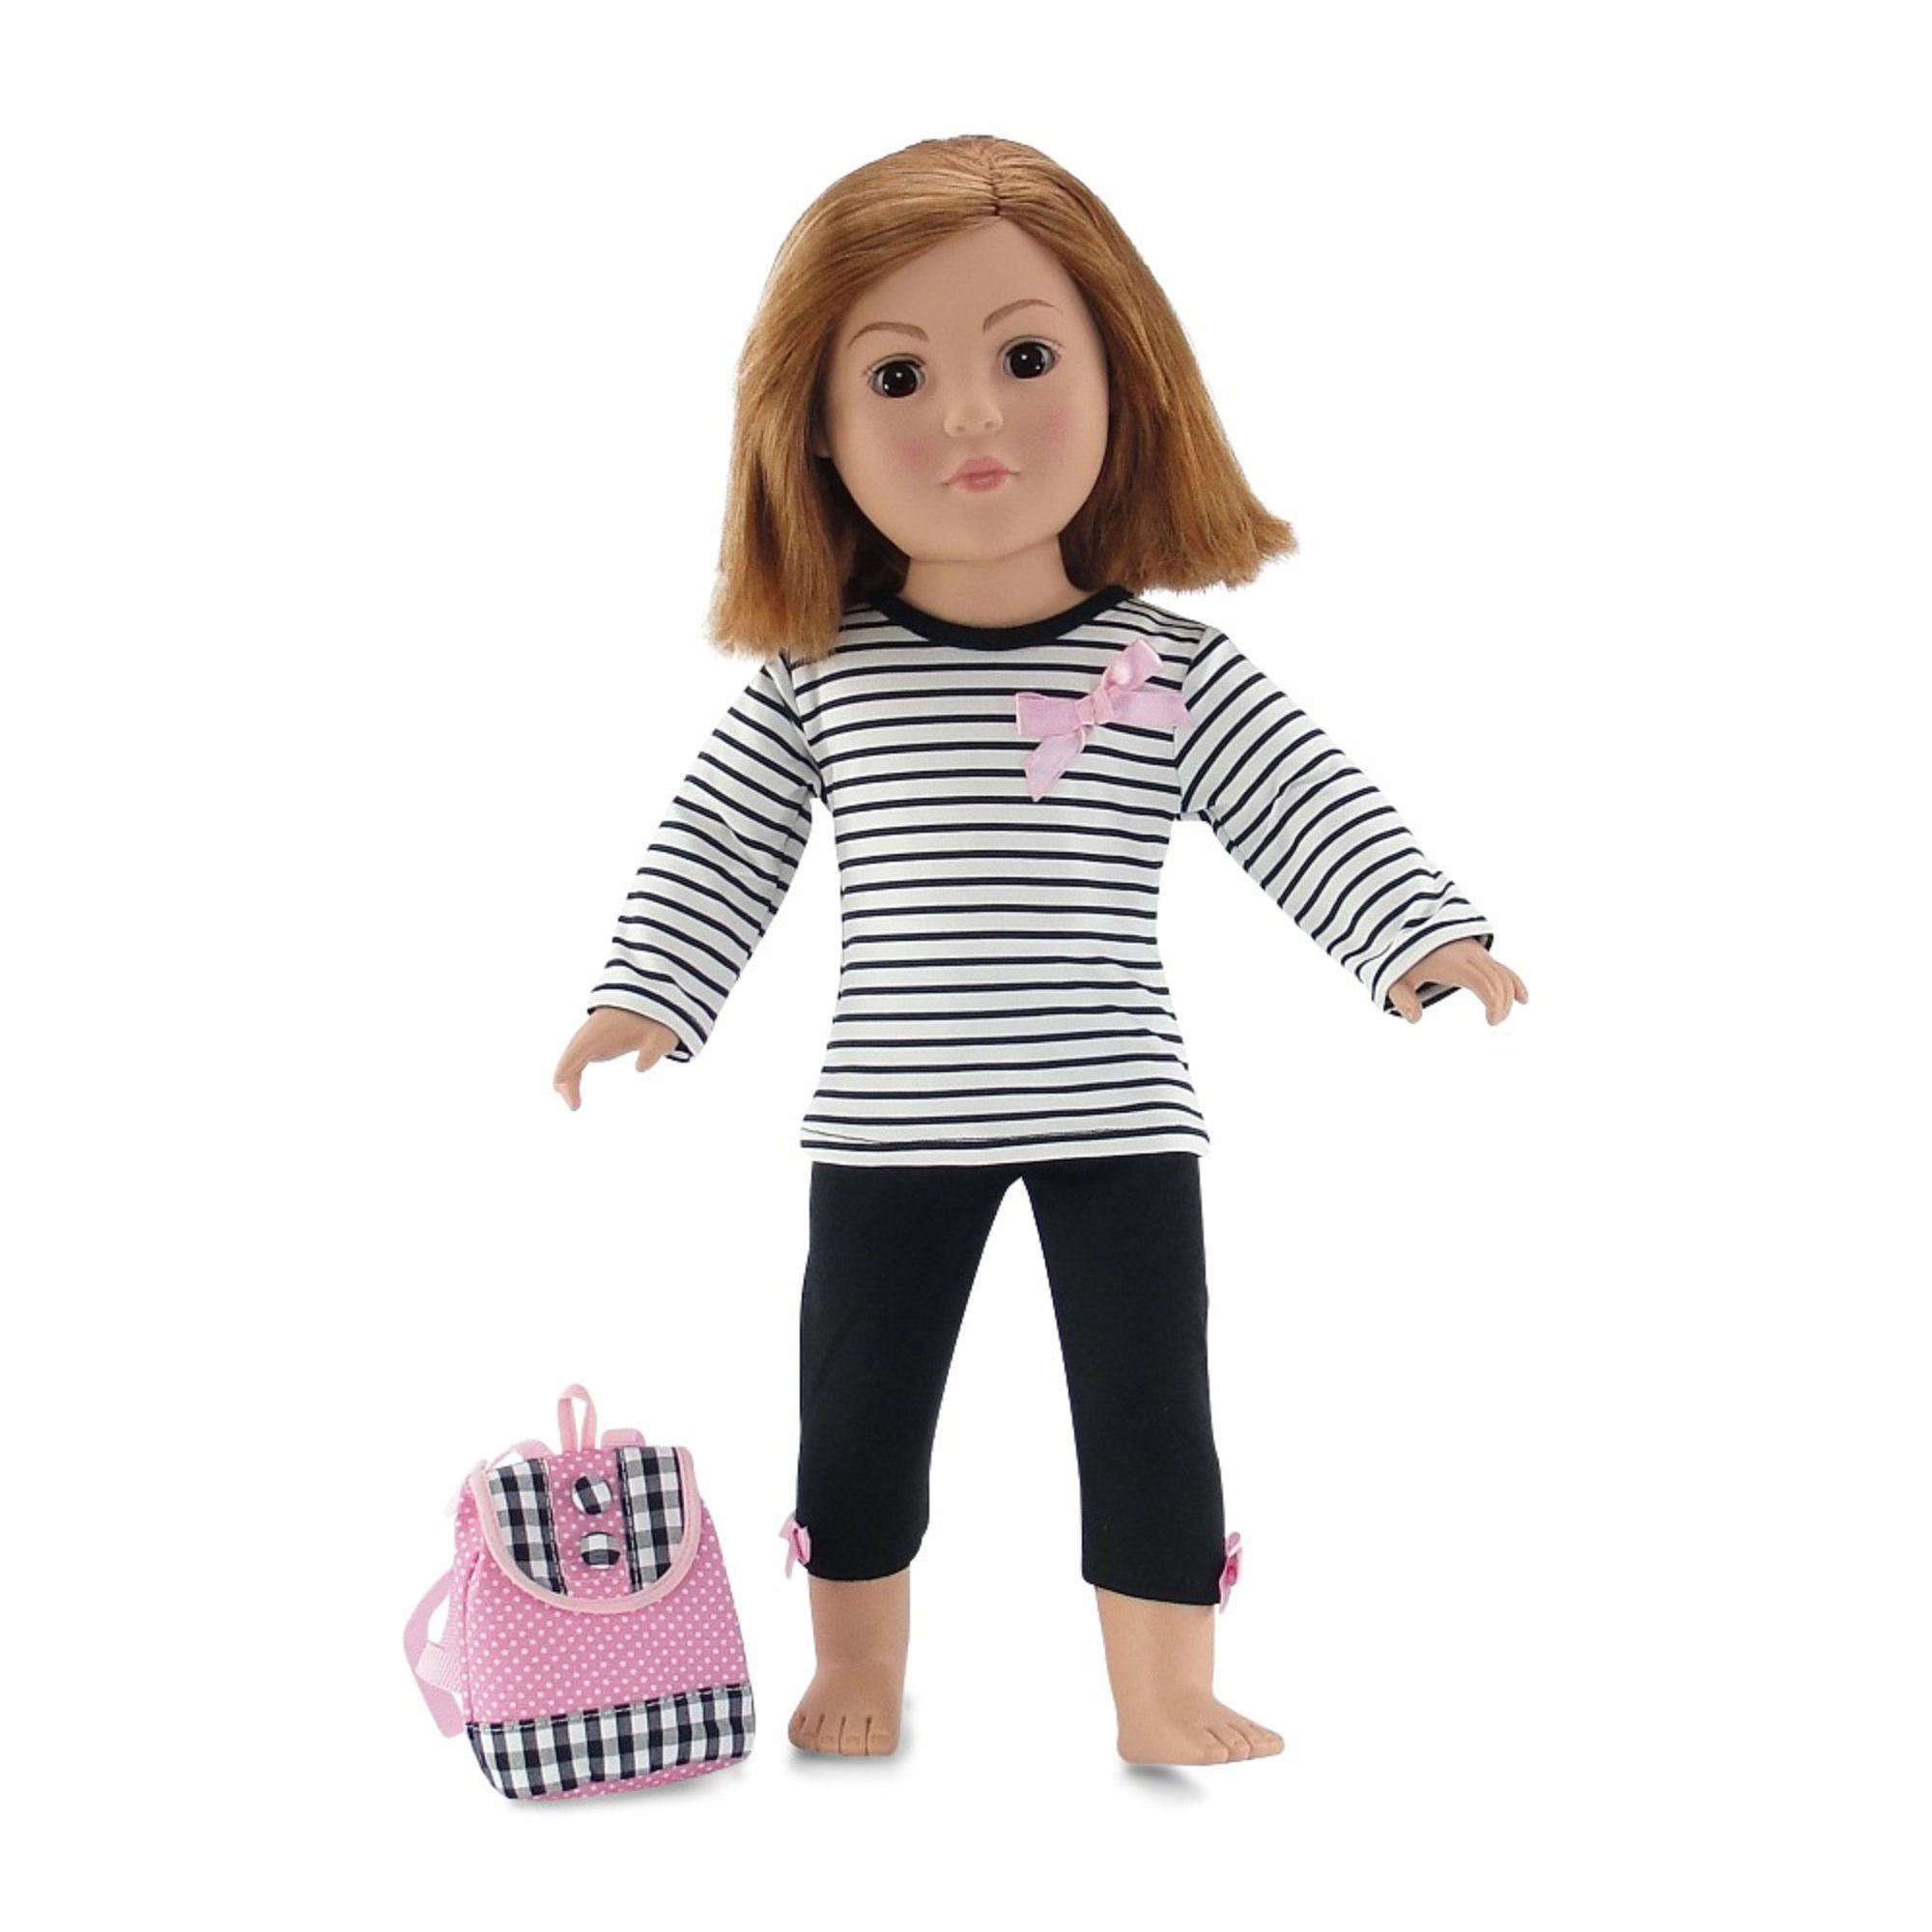 Boneca American Girl: Blusa Listrada e Legging (Preto e Branco) (Apenas Venda Online)